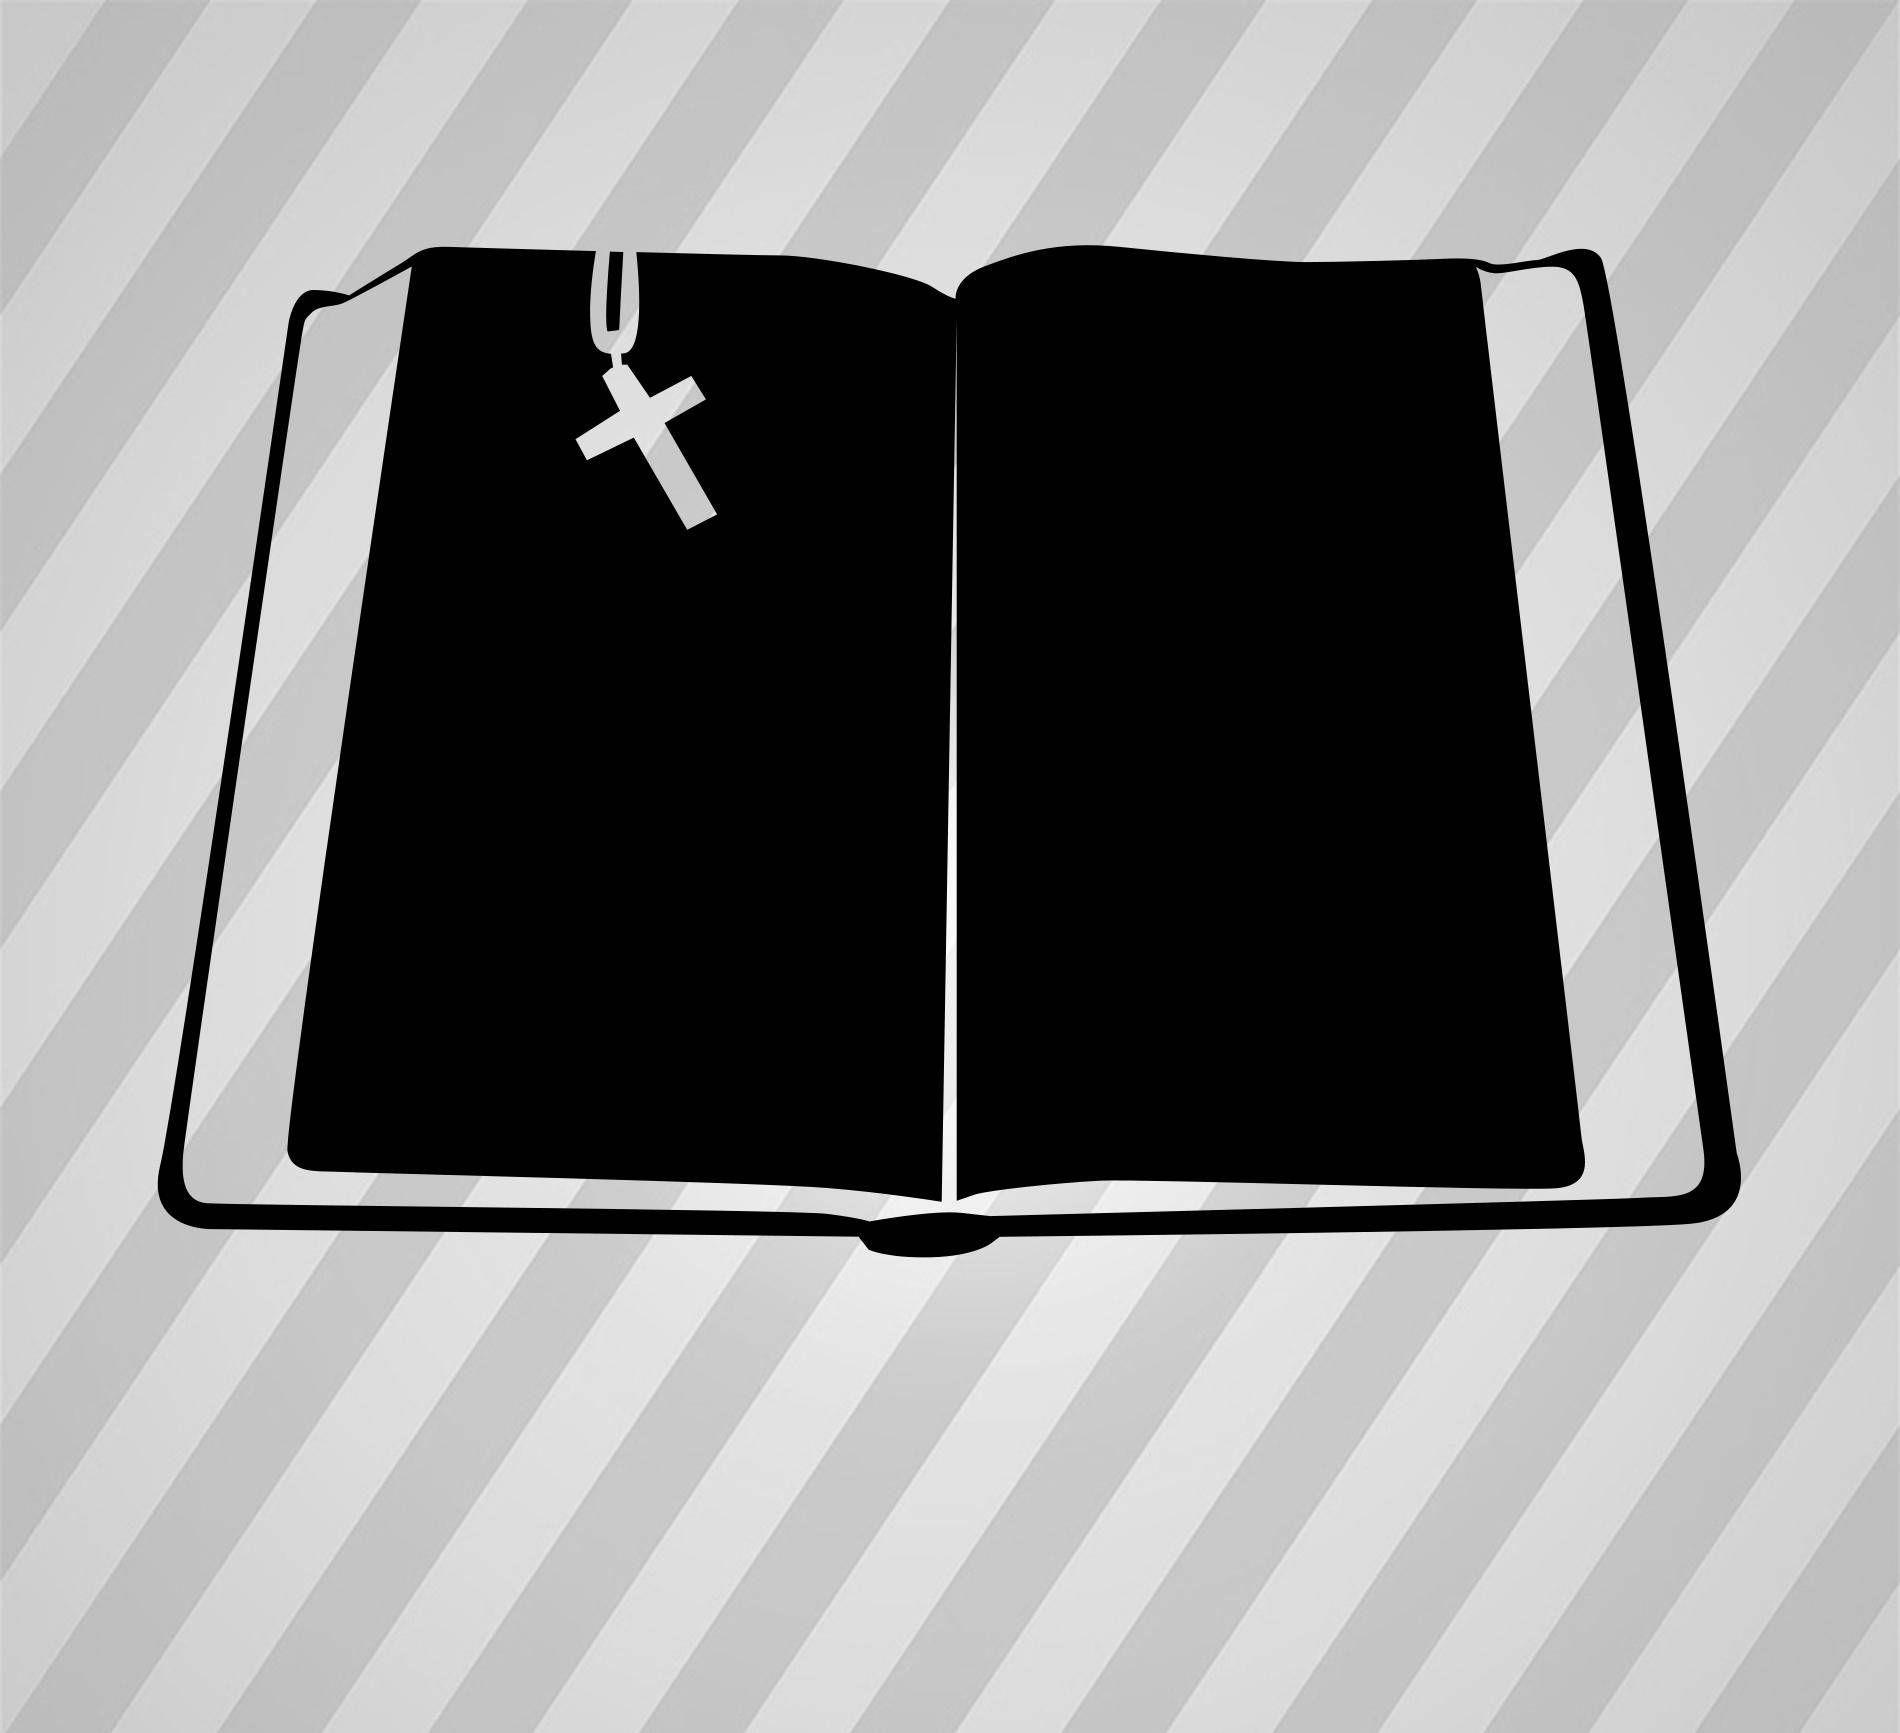 1900x1733 Book Bible Silhouette Bible Book